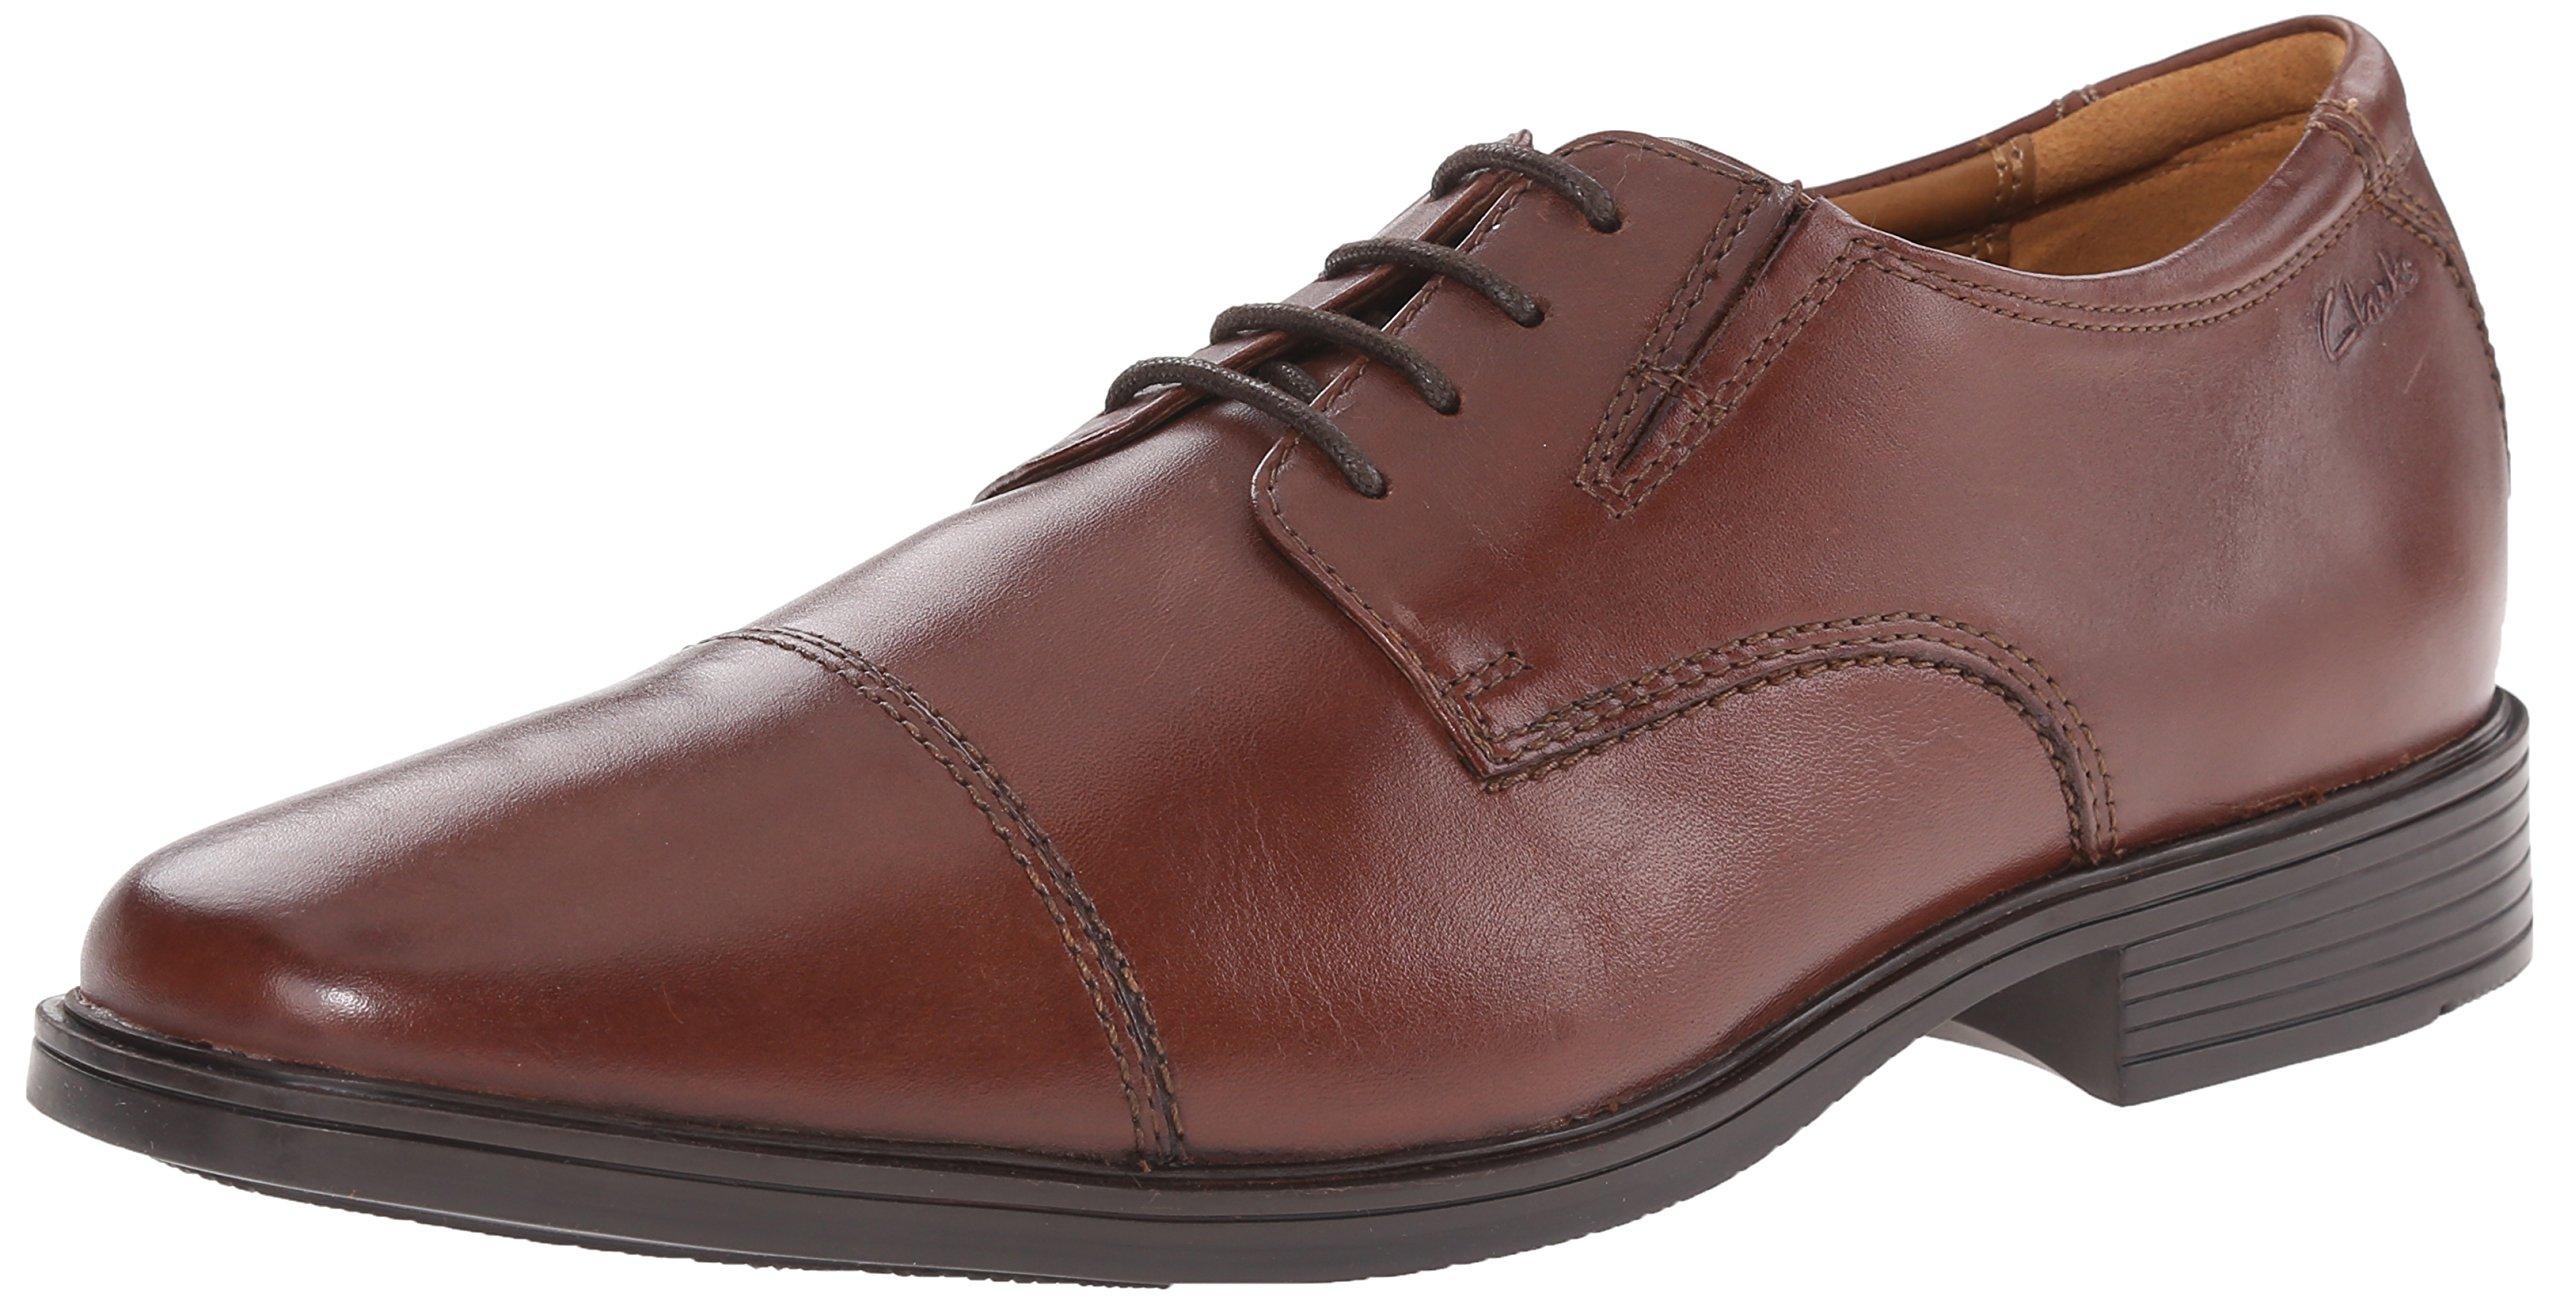 Clarks Men's Tilden Cap Oxford Shoe,Brown Leather,12 M US